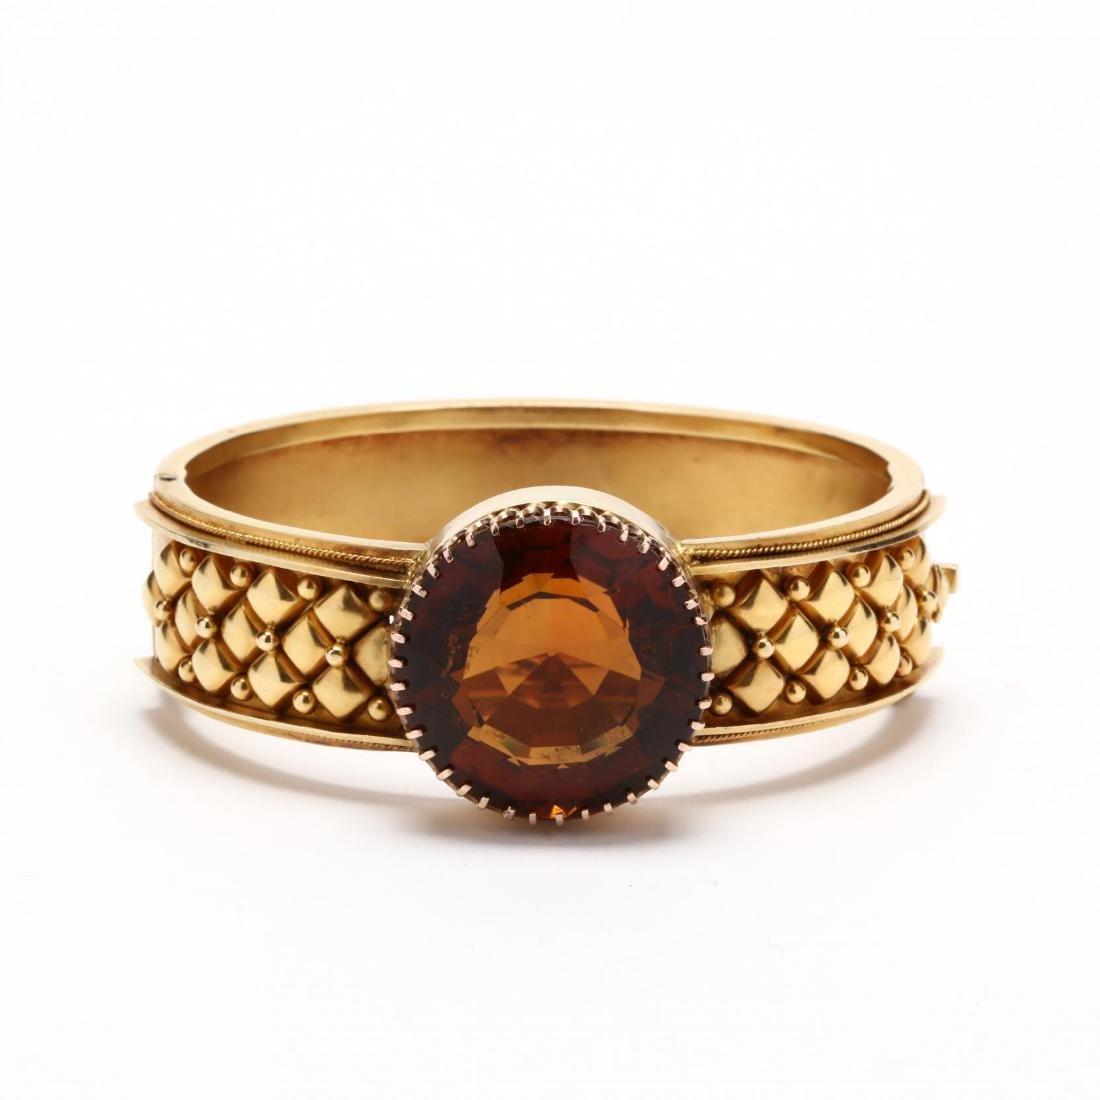 Victorian 14KT Gold and Madeira Citrine Bracelet